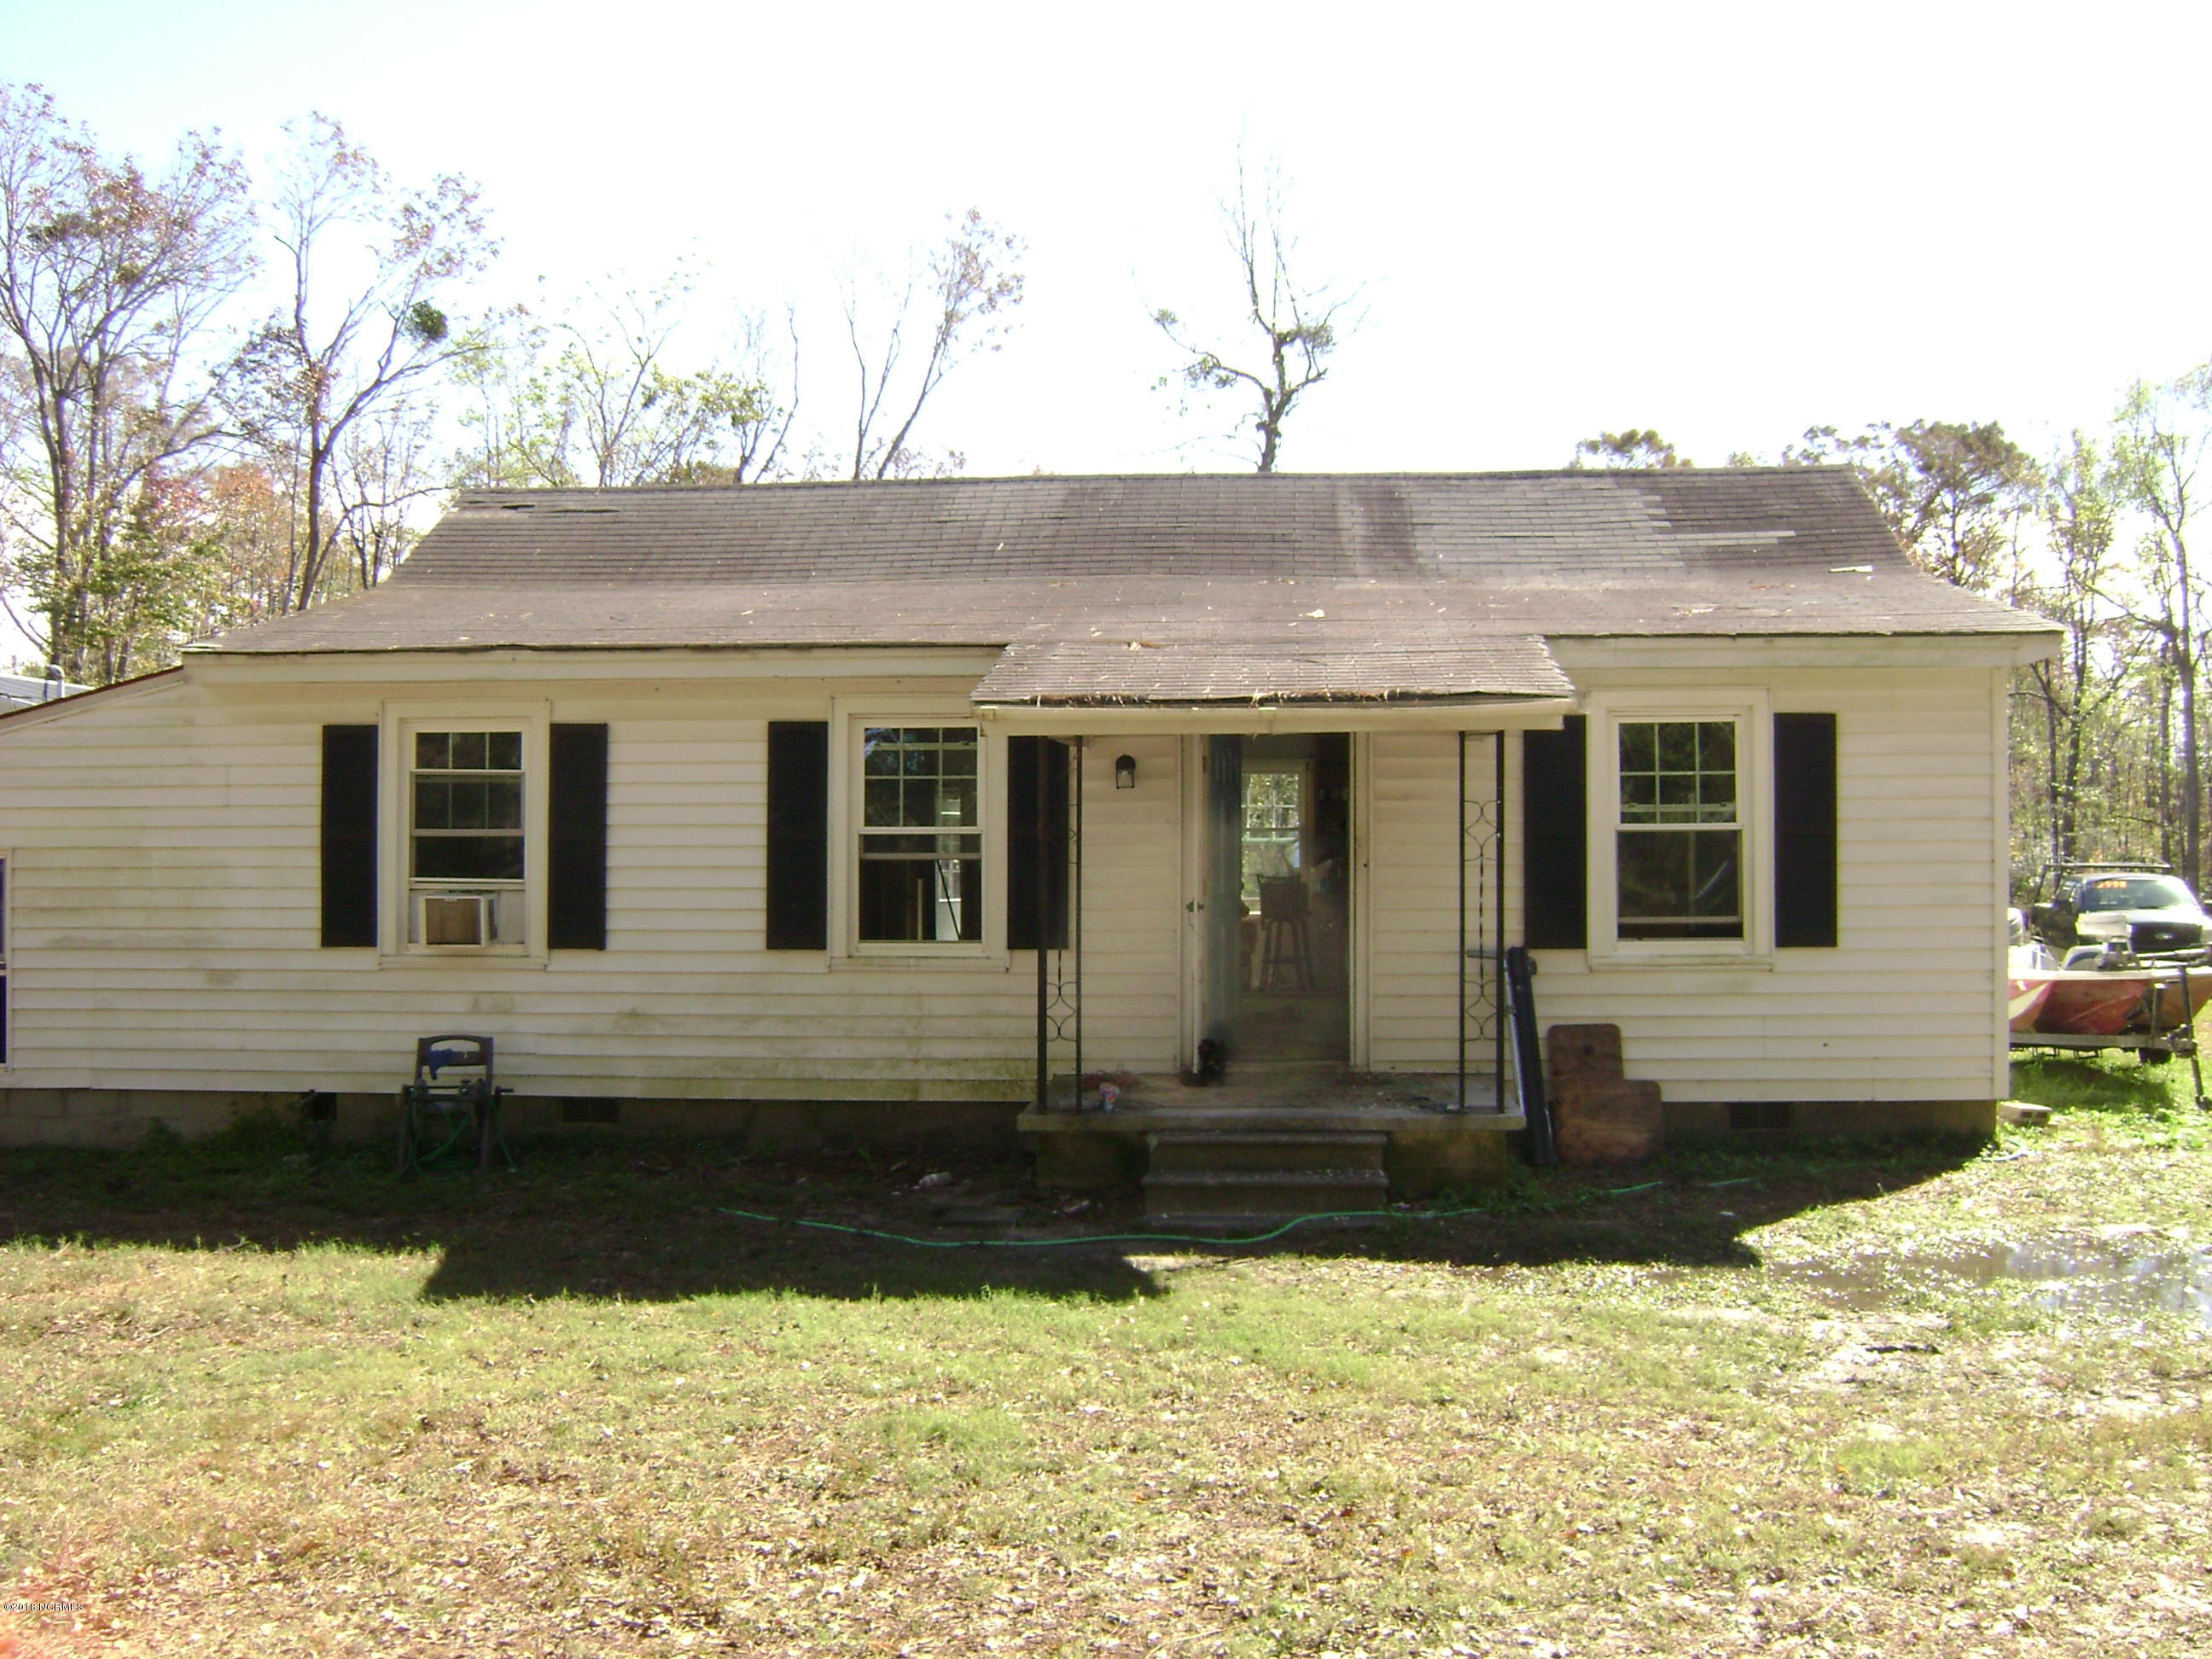 104 Brown Street, Havelock, North Carolina, 2 Bedrooms Bedrooms, 5 Rooms Rooms,1 BathroomBathrooms,Single family residence,For sale,Brown,100139017